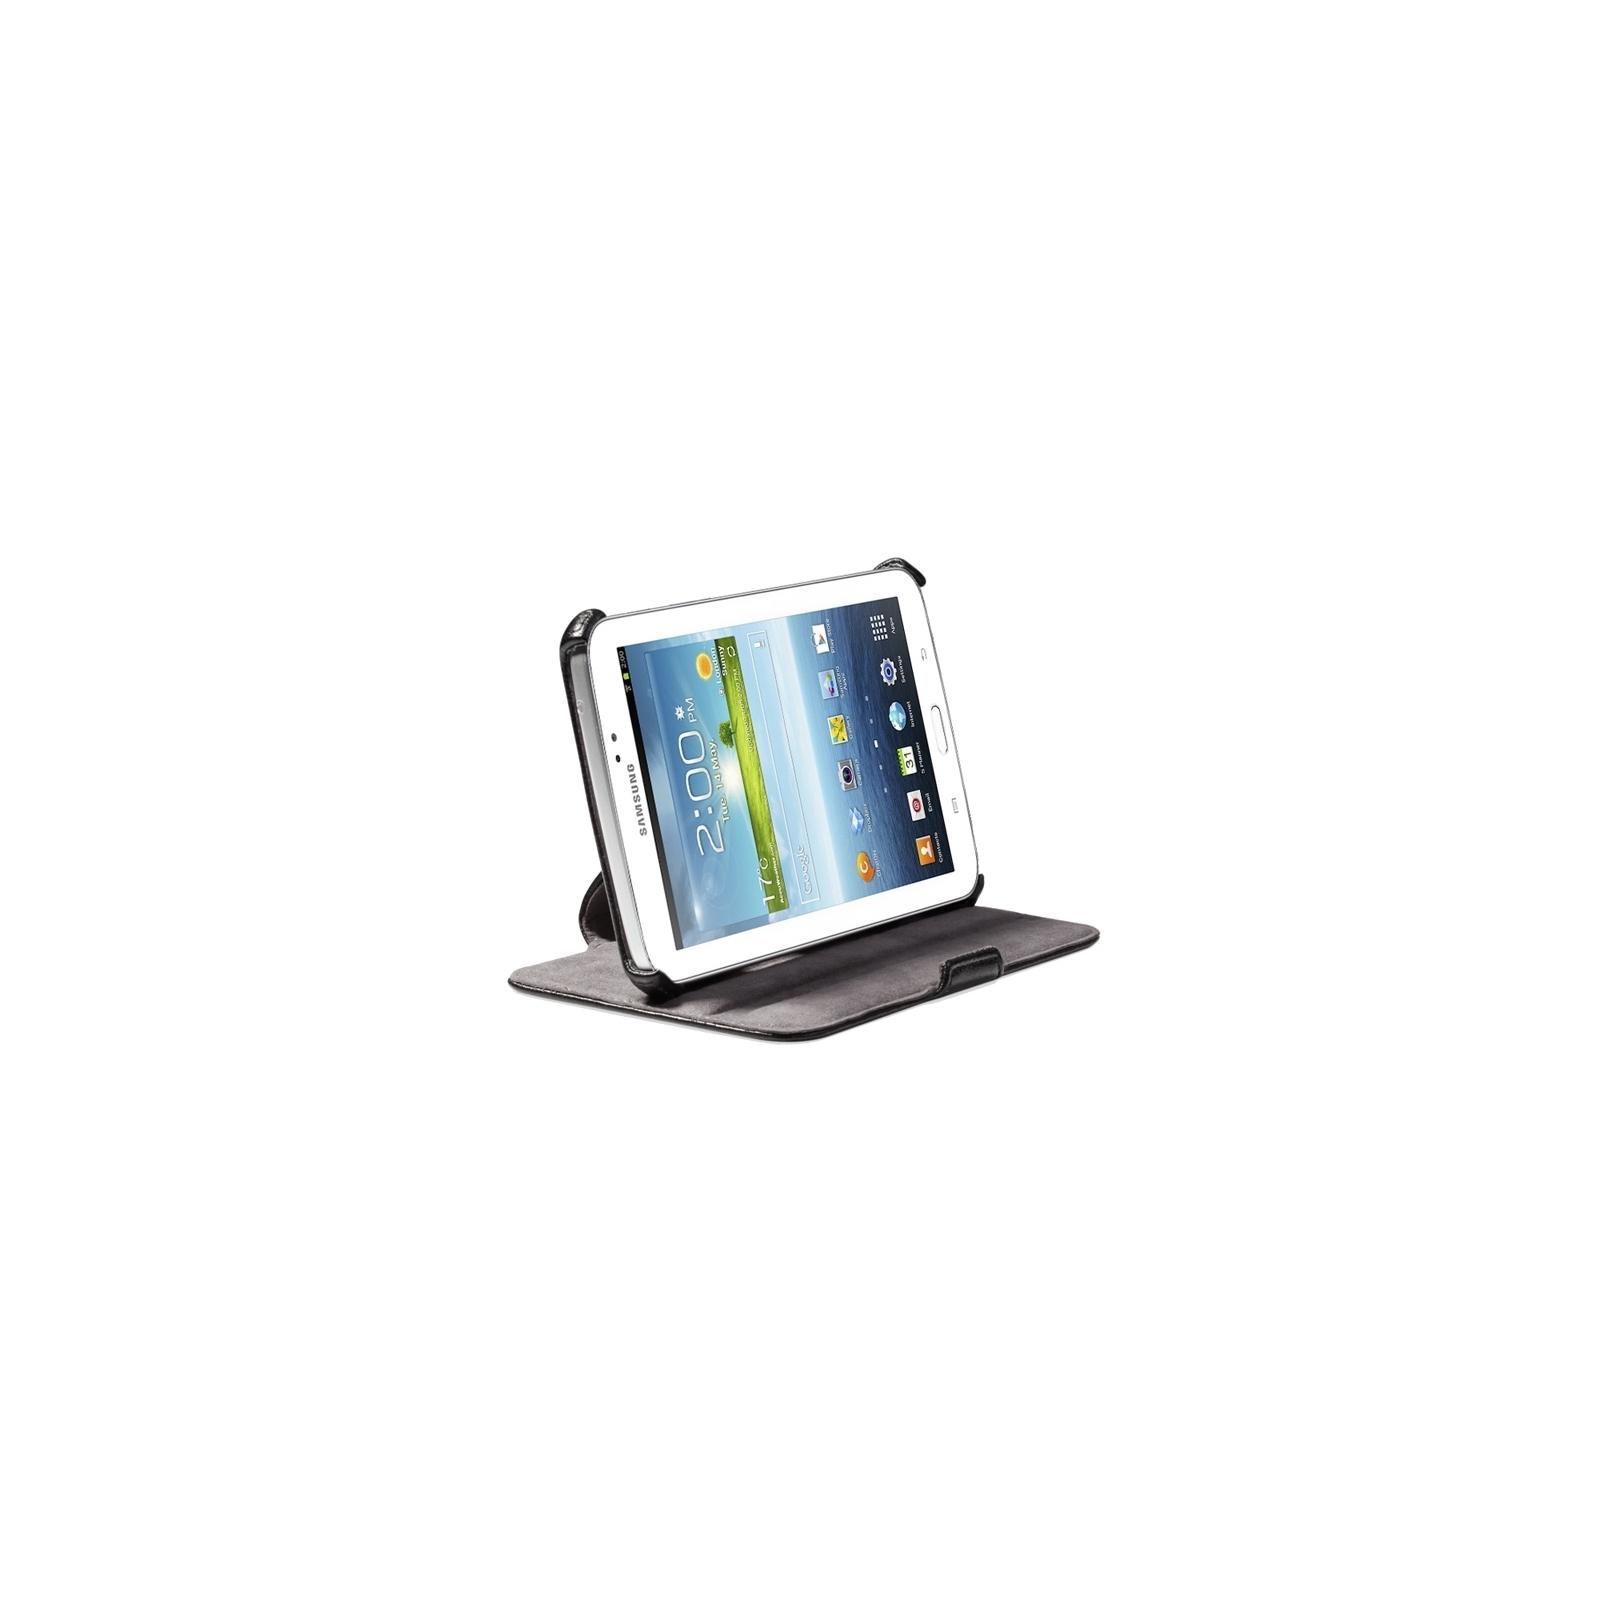 Чехол для планшета AirOn для Samsung Galaxy Tab 3 7'' black (6946795824954) изображение 2